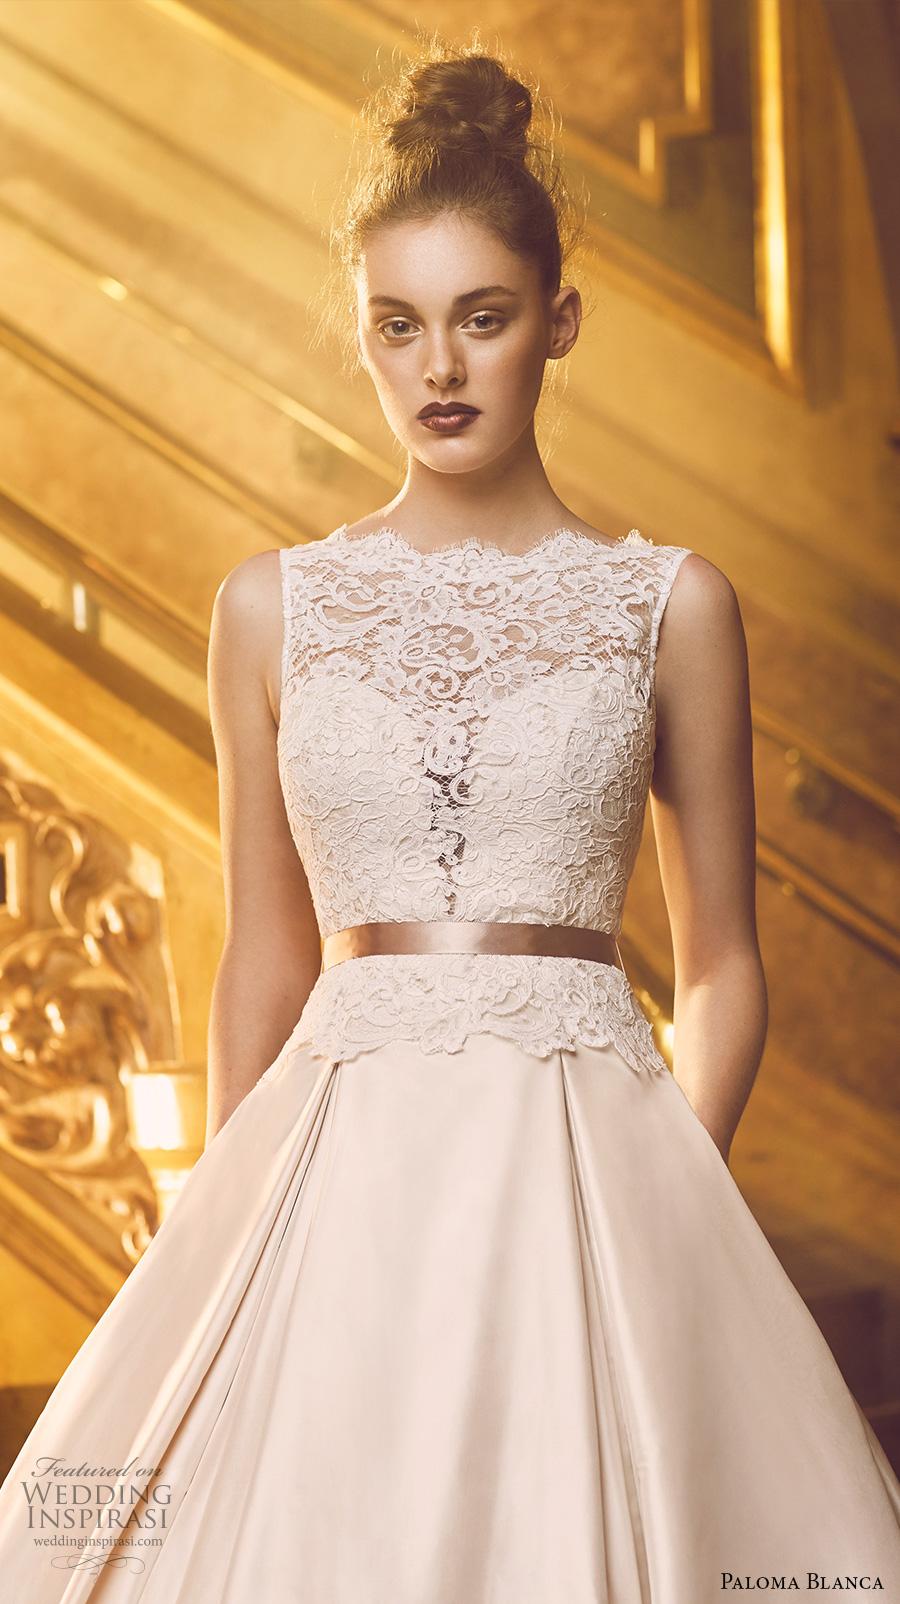 Paloma Blanca Wedding Dresses For Sale 9 Good Paloma Blanca Fall Wedding